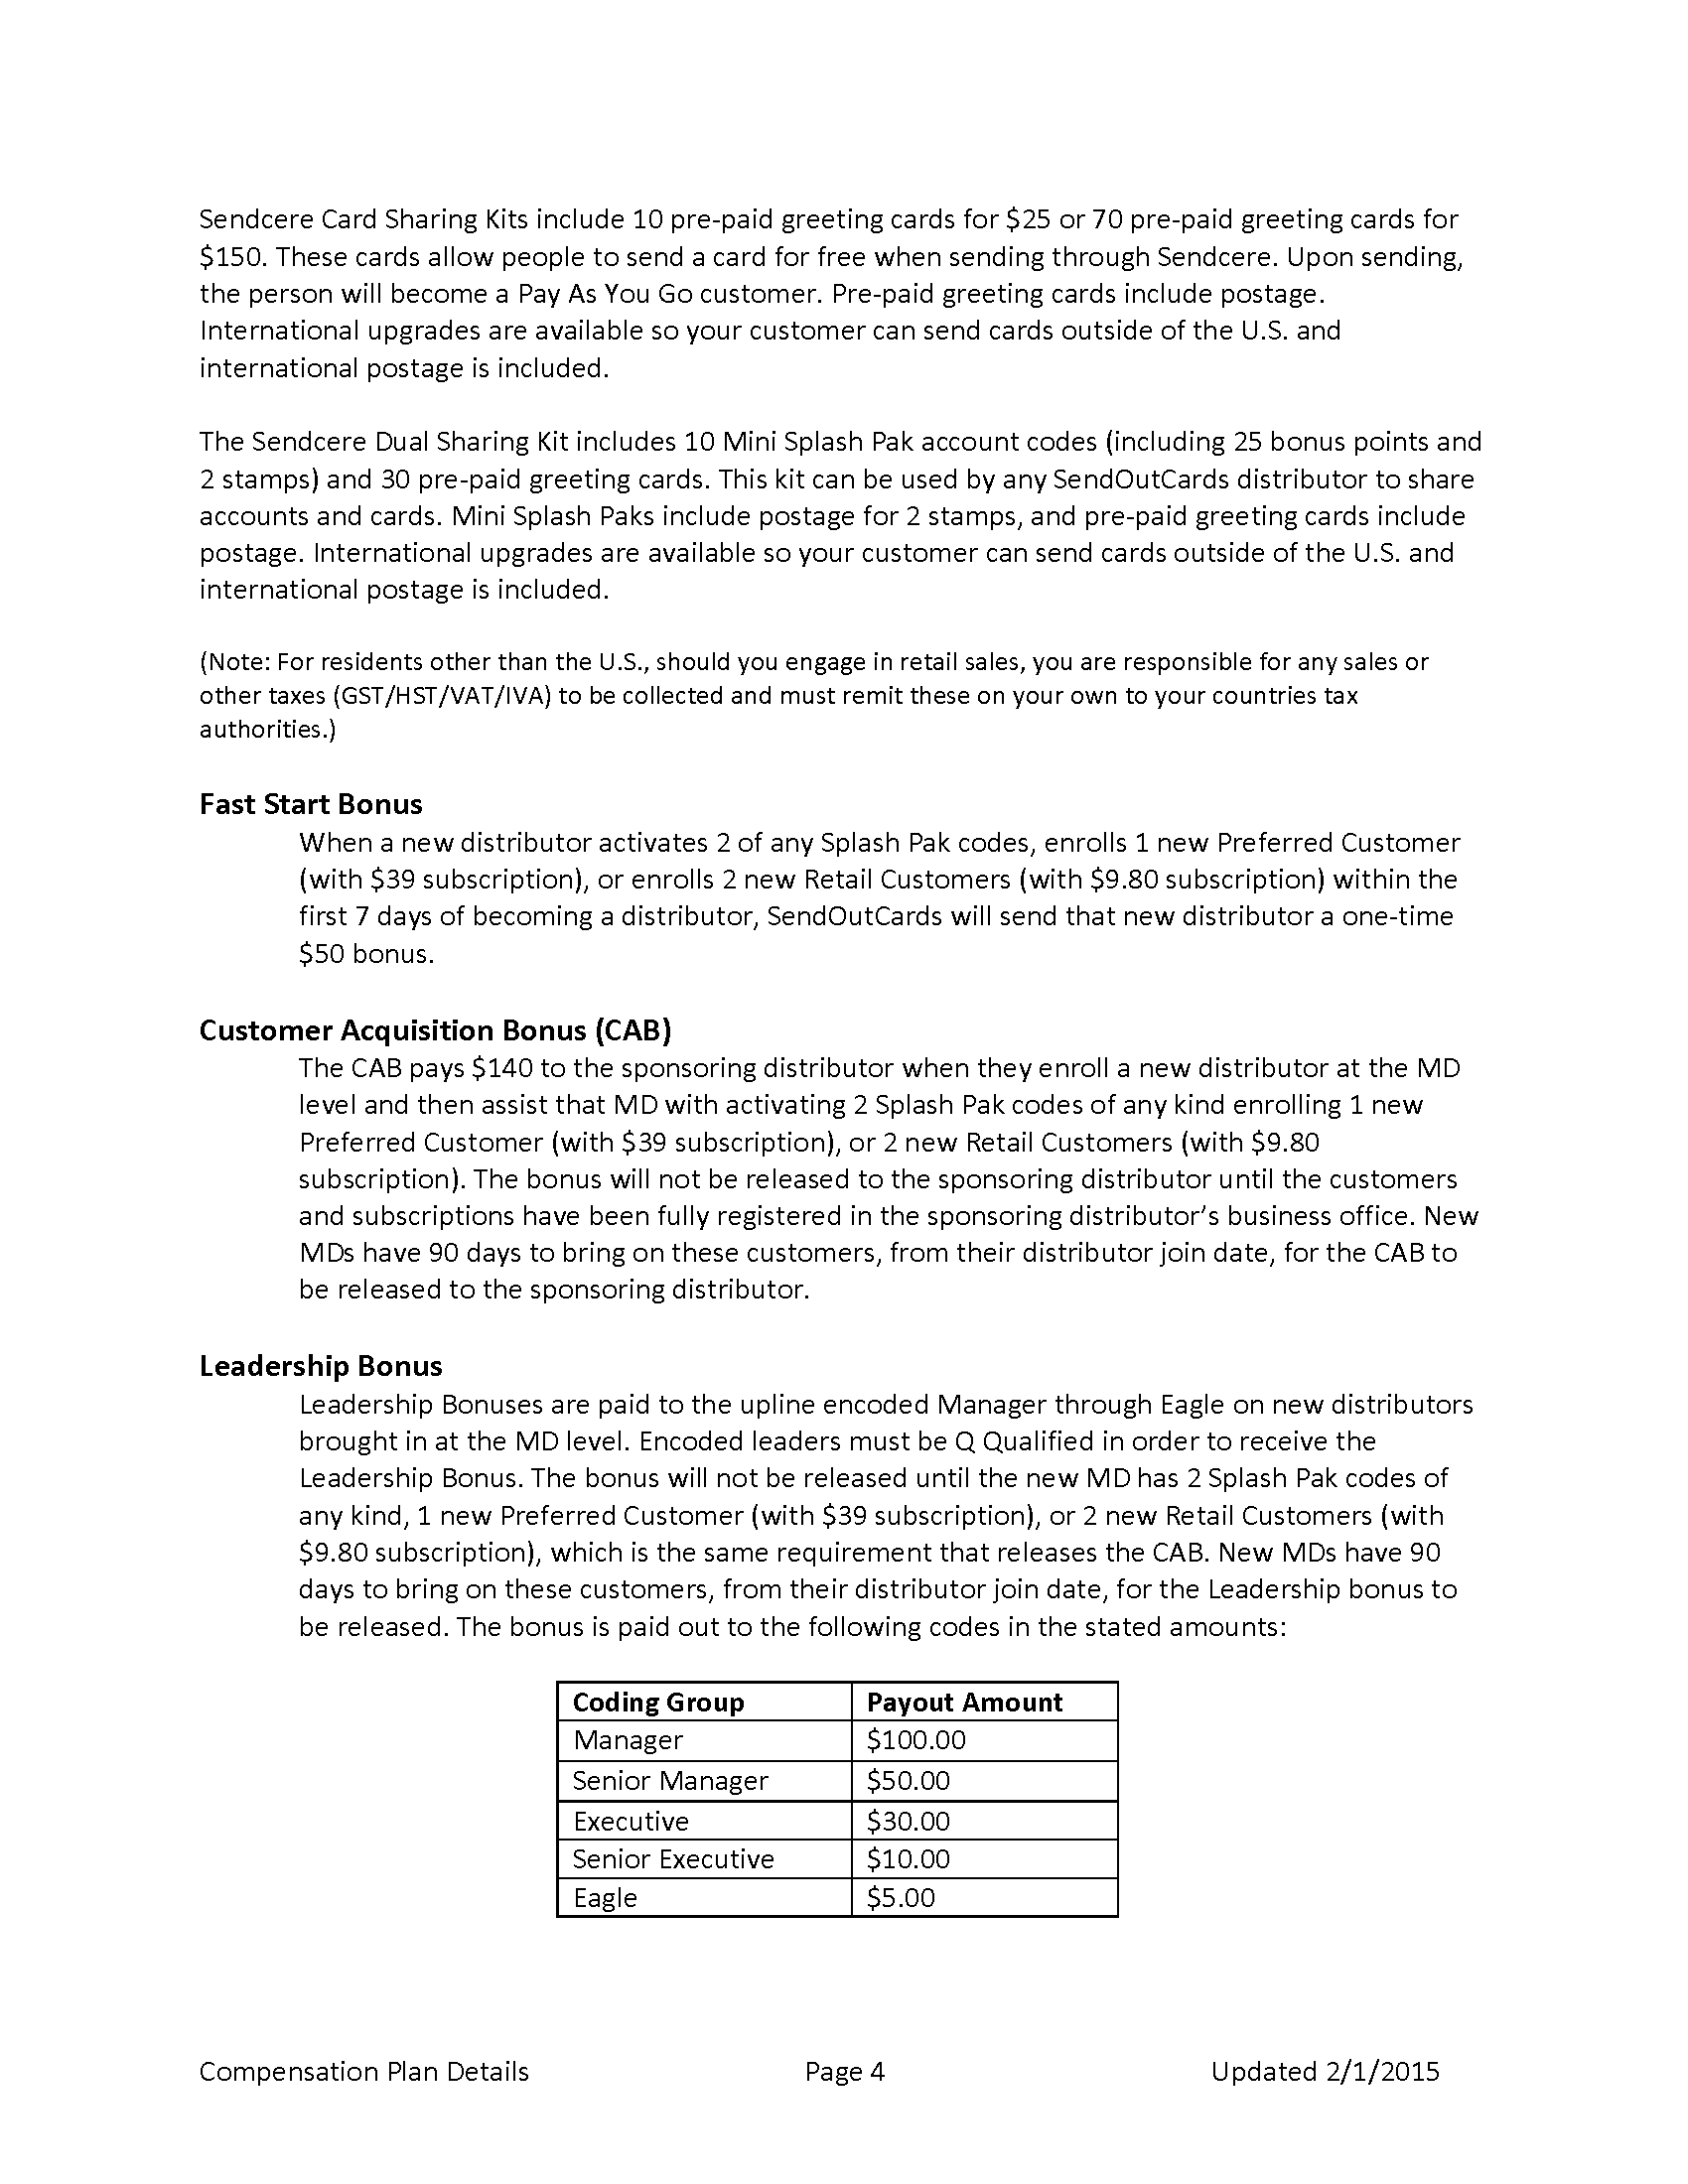 MLMLegal.Com---MLM Company Profiles